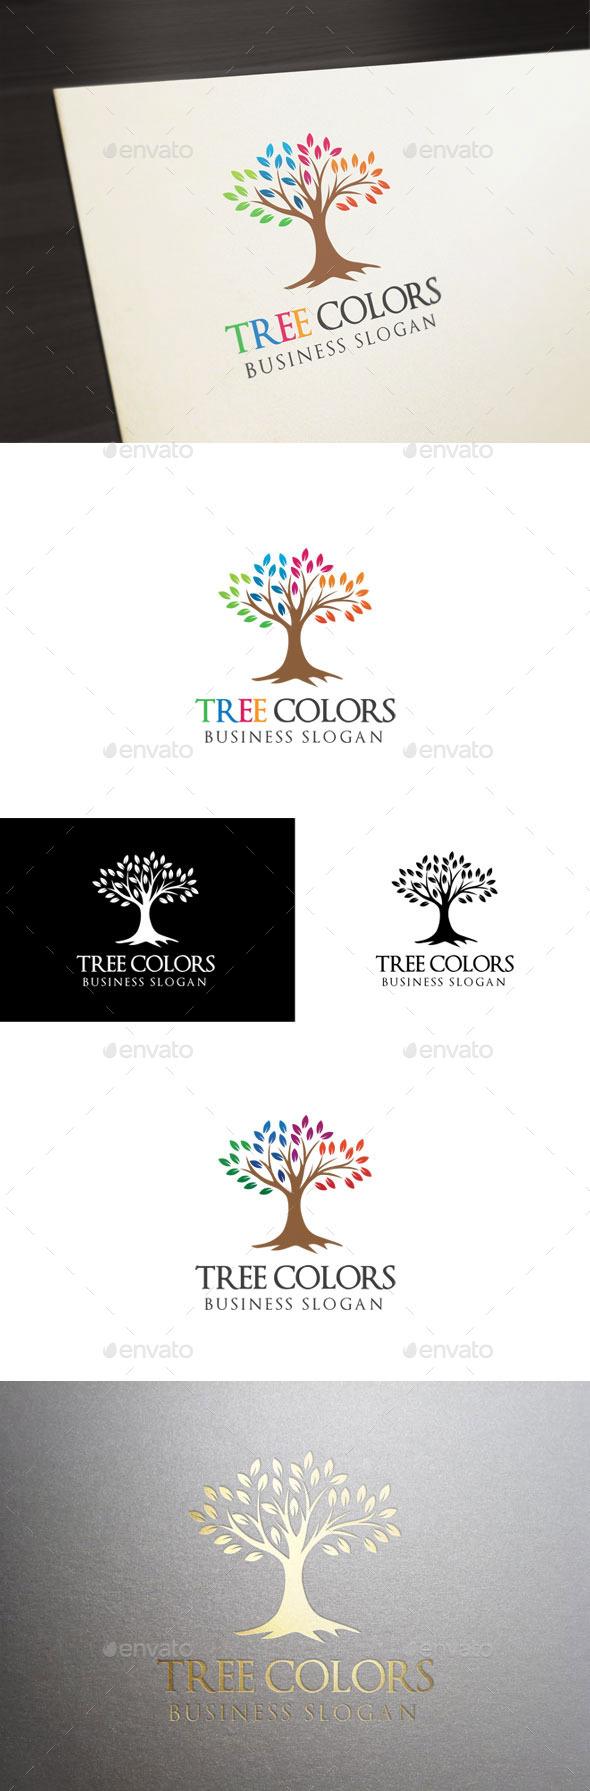 GraphicRiver Tree Colors 11125414